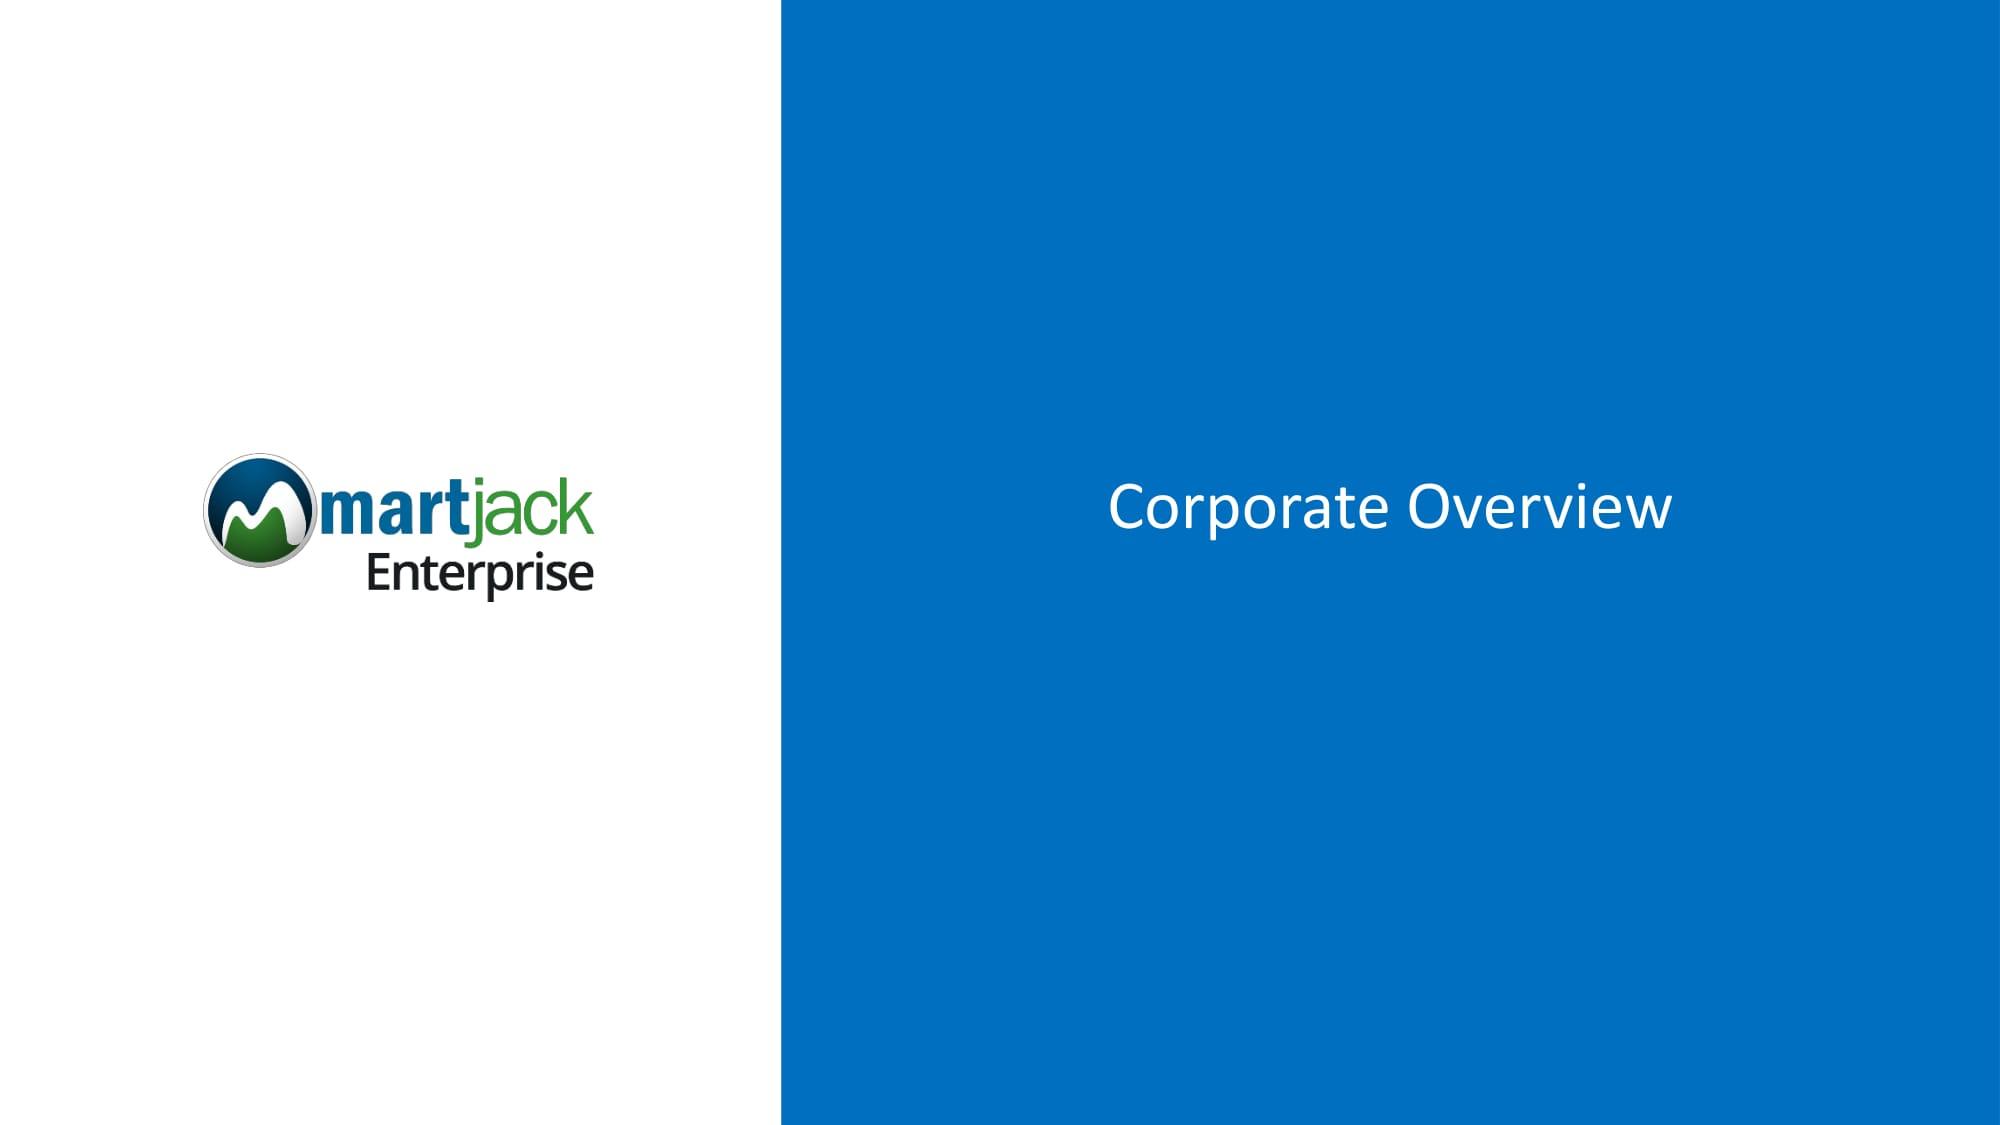 martjack_corporate_and_platform_overview-02